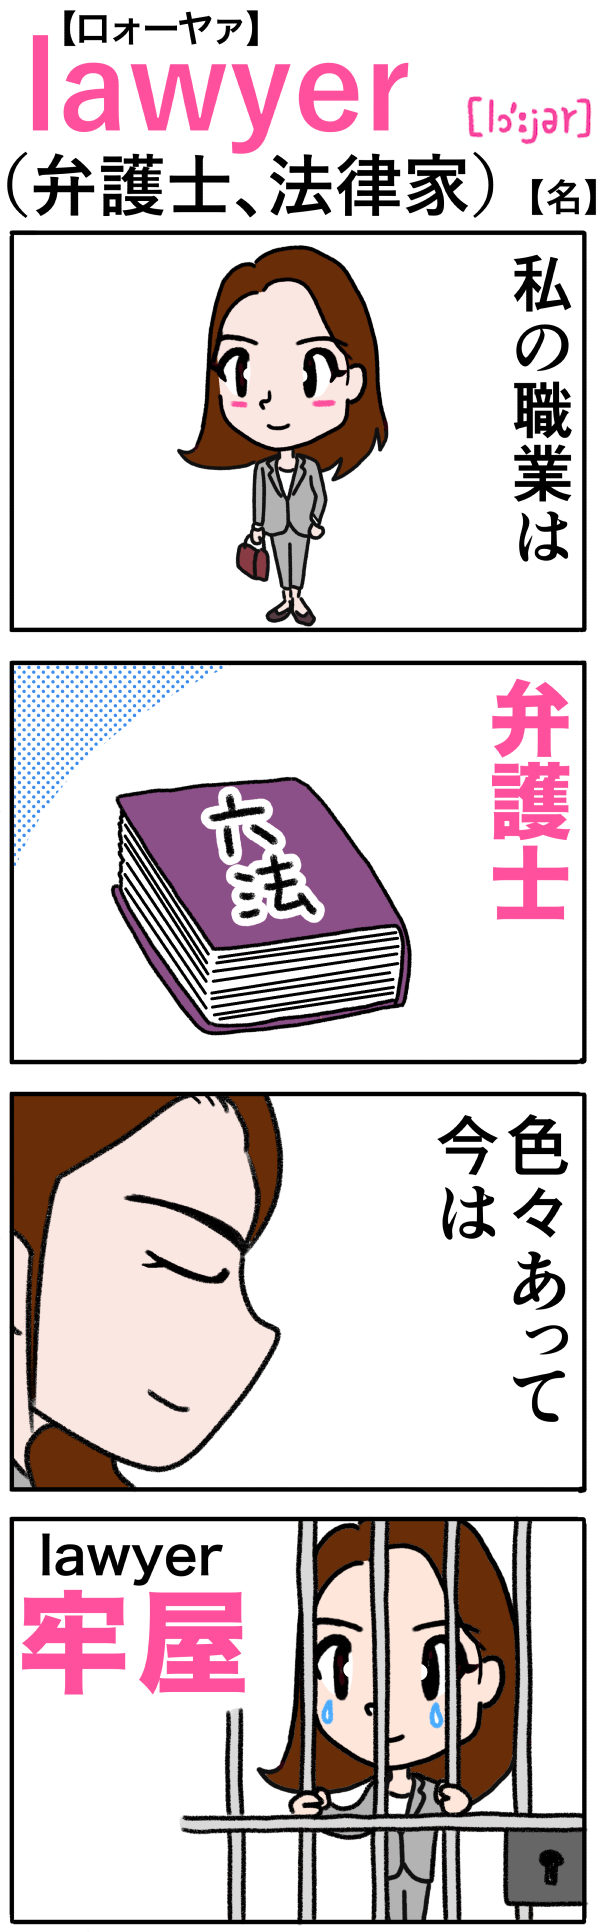 lawyer(弁護士)の語呂合わせ英単語